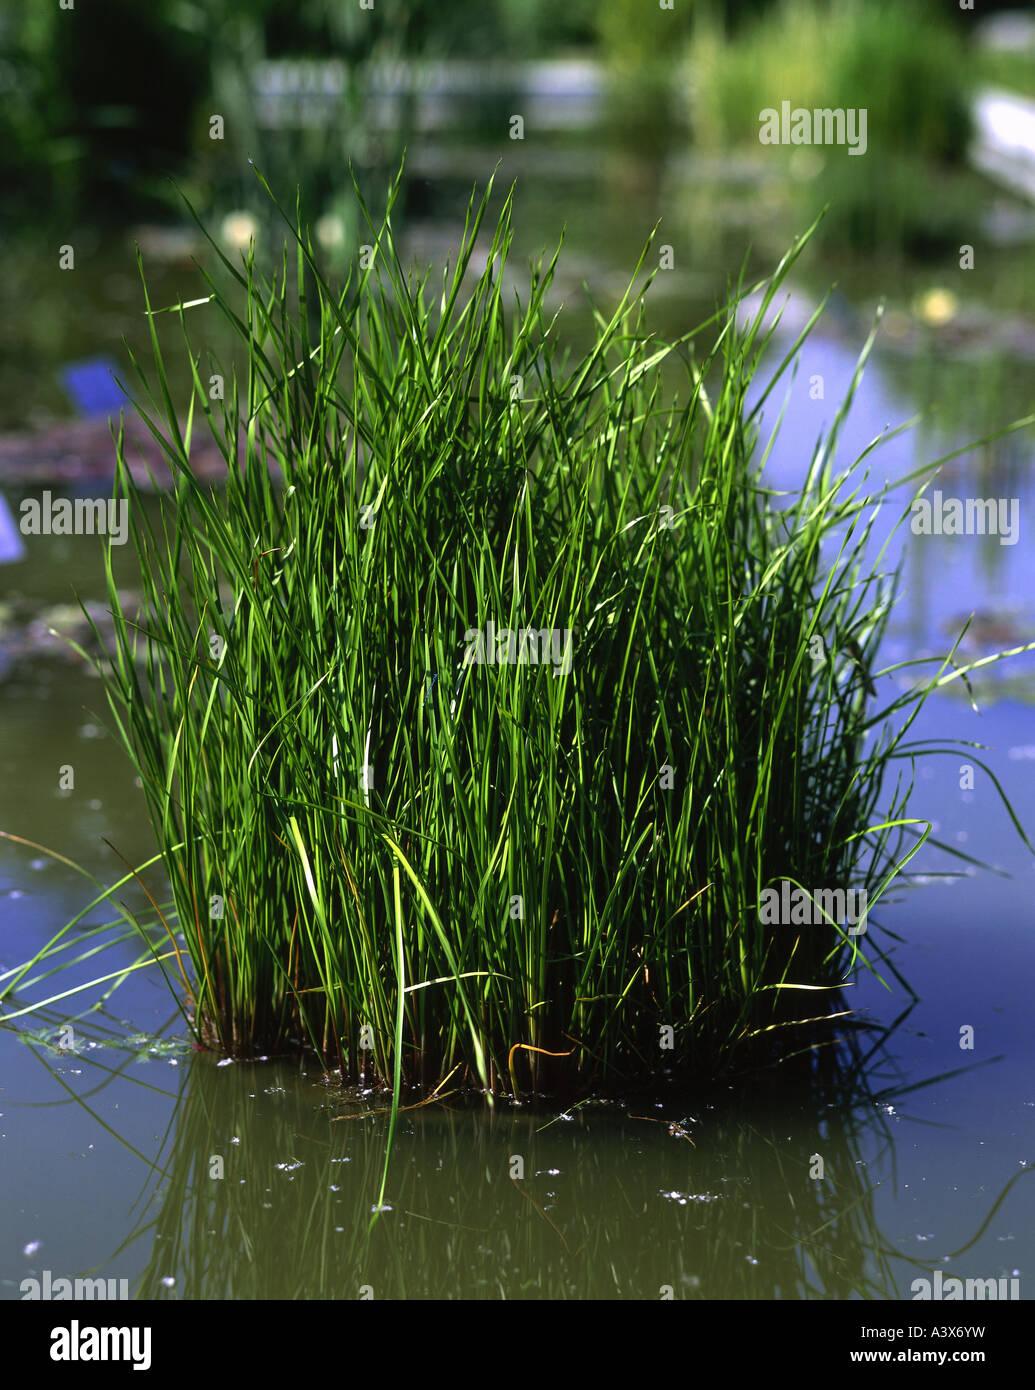 Aquatic plants with common names